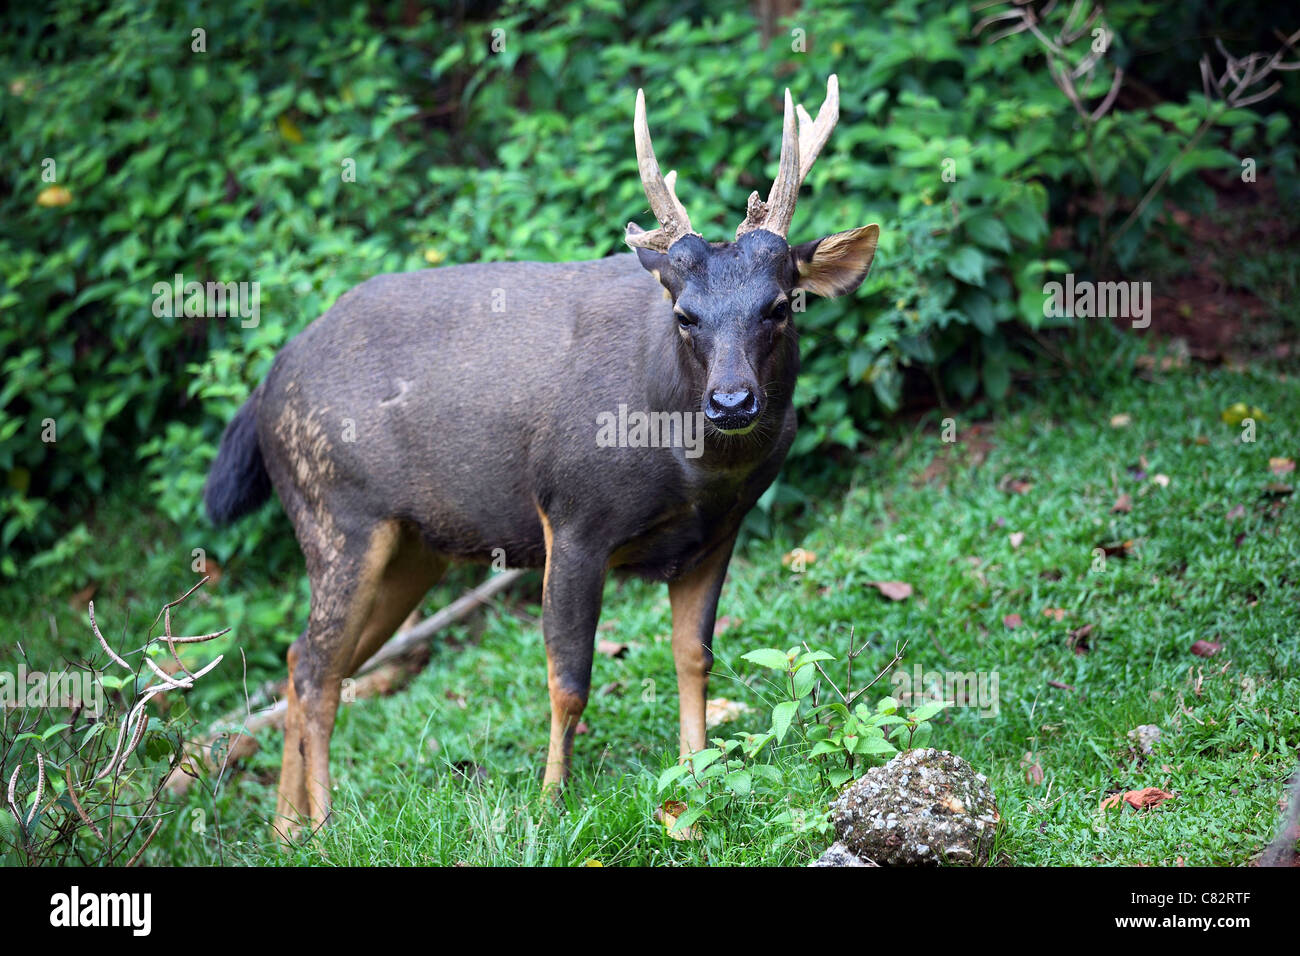 Sambar deer at Melaka zoo. - Stock Image